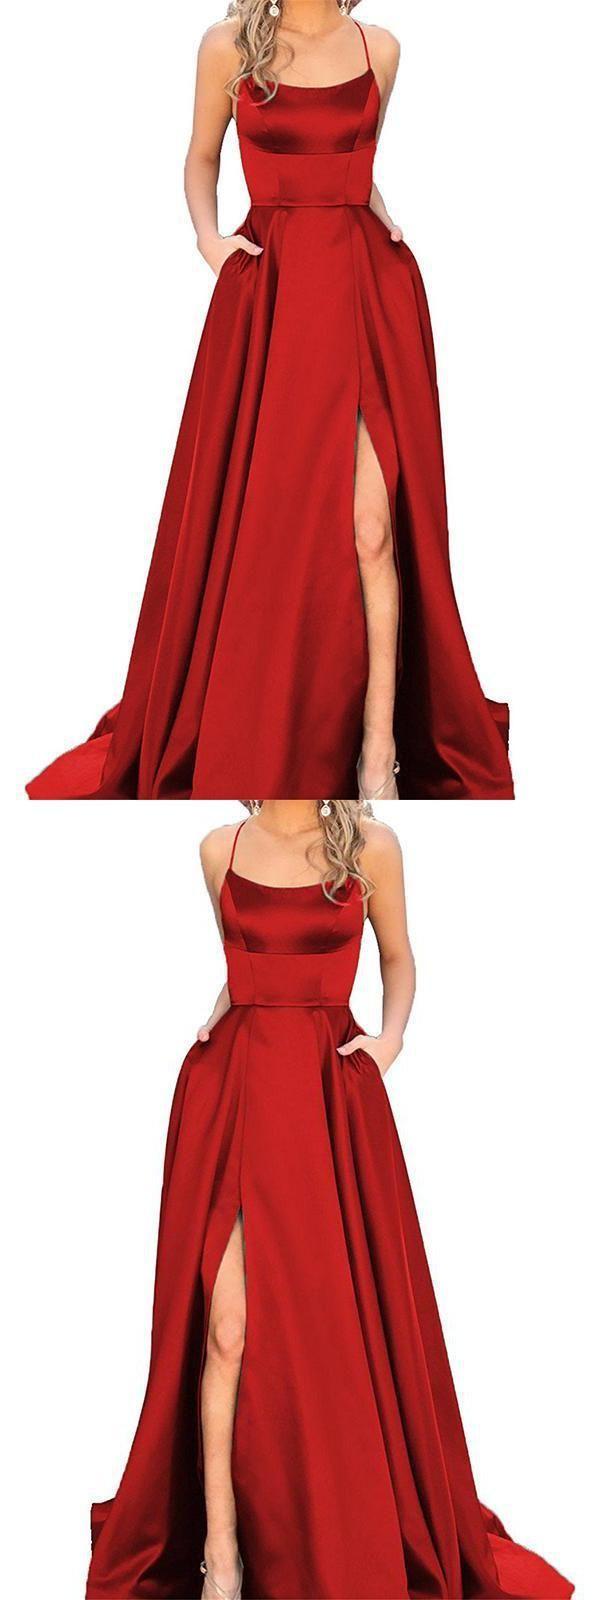 2018 Party Dresses, Party Dresses Long, Red Party Dresses, Party Dresses For Cheap Prom Dresses 2019